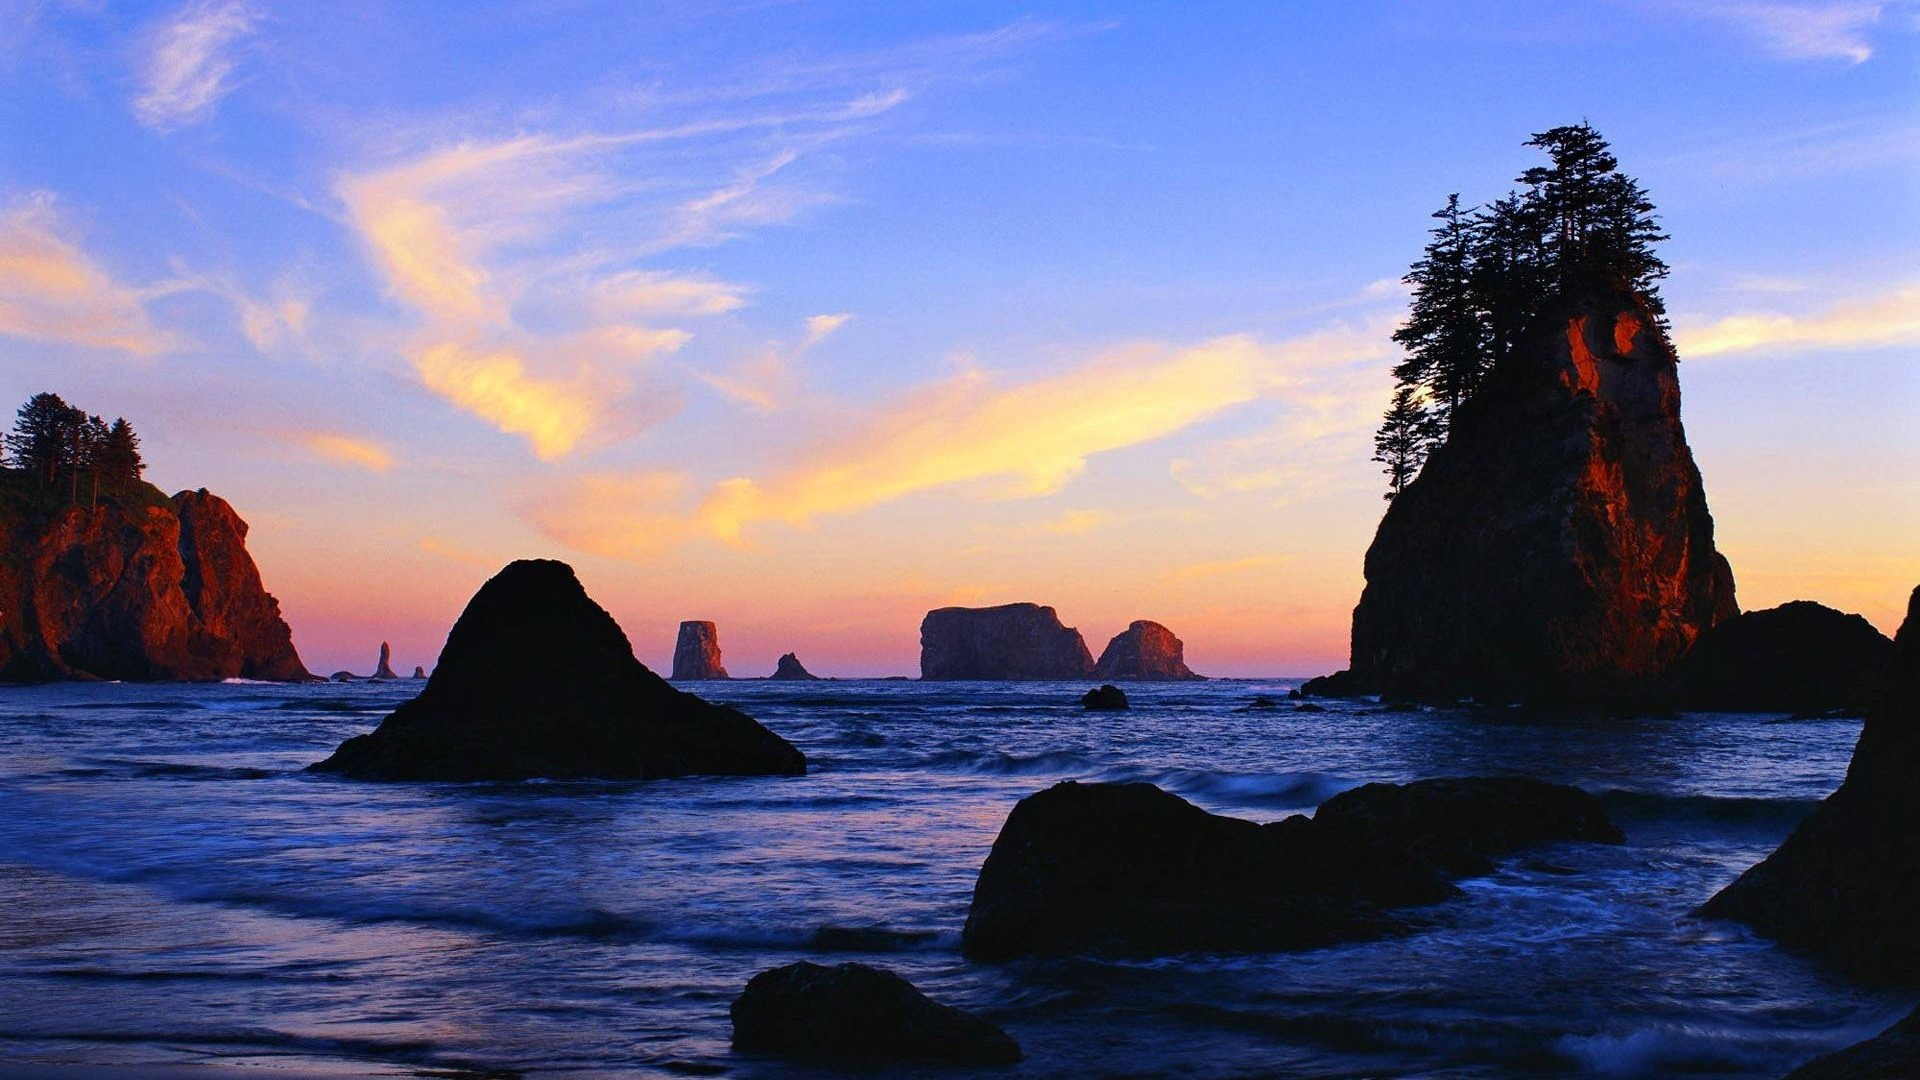 Sunset Tag – Sunrise Lovely Clouds Brach Nice Nature Shore Sea Summer Waves  Coast Pretty Amazing